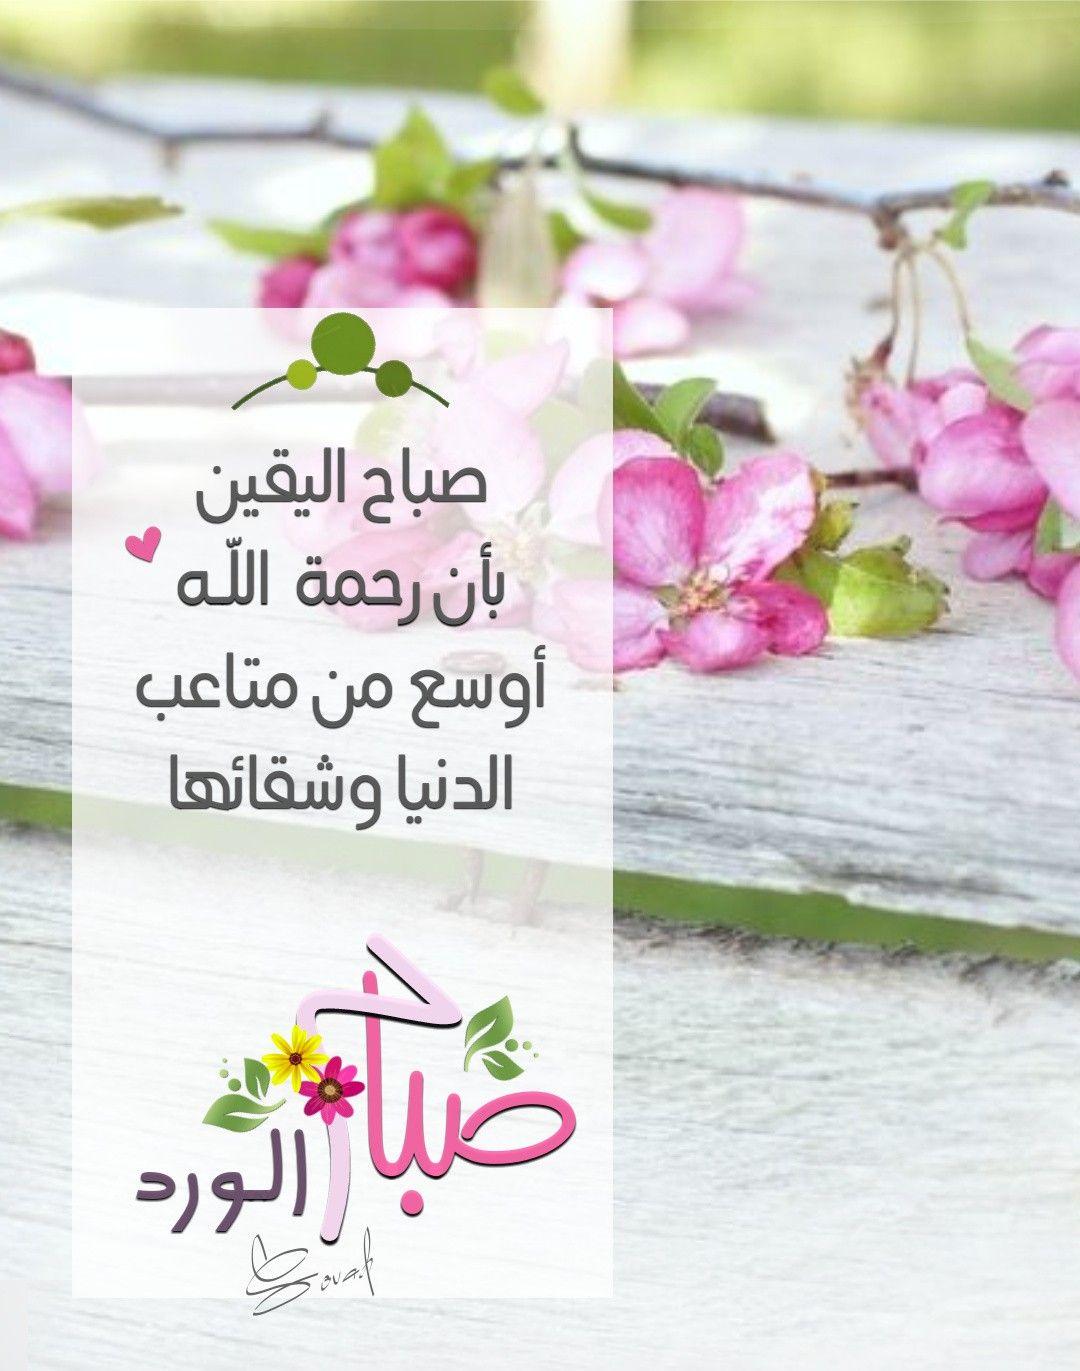 Pin By Sou Ad On صباح الخير Good Morning Images Flowers Good Morning Arabic Morning Greeting